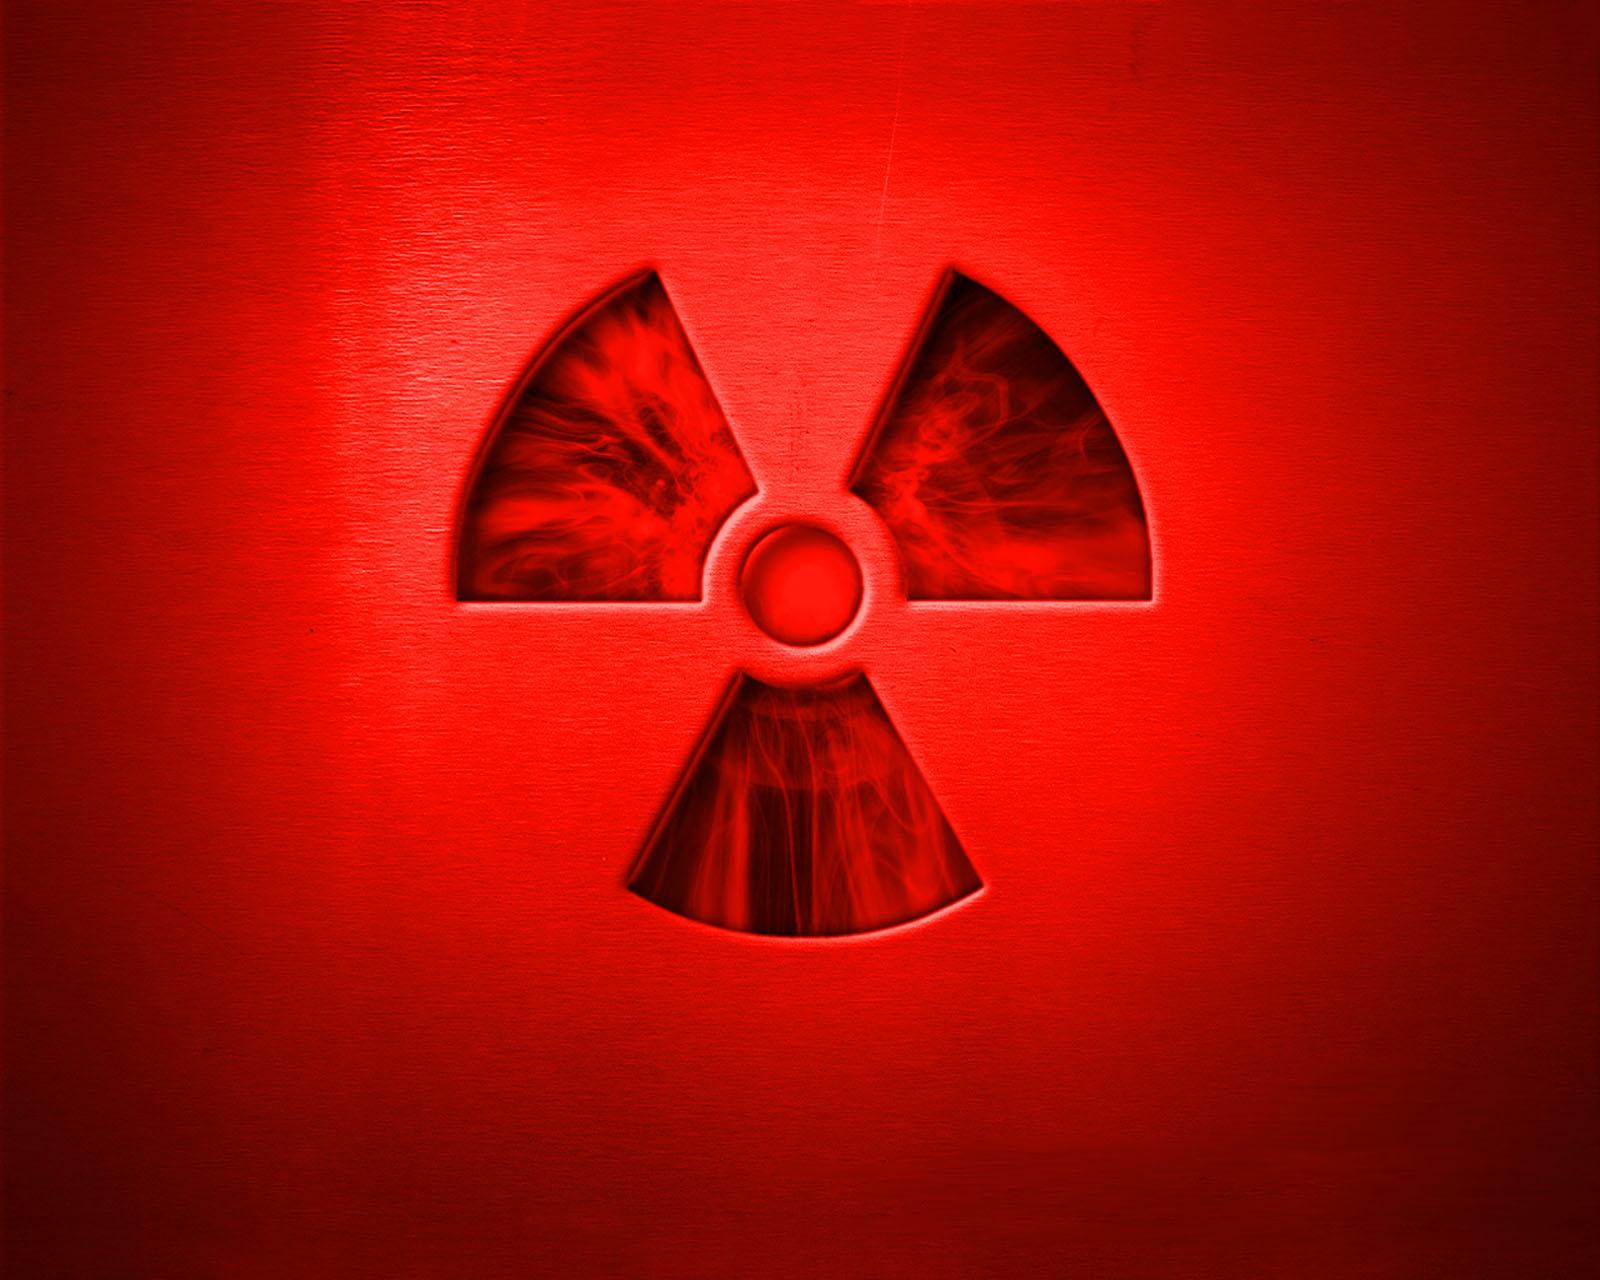 radiation hazard symbol hd wallpaper hd wallpapers